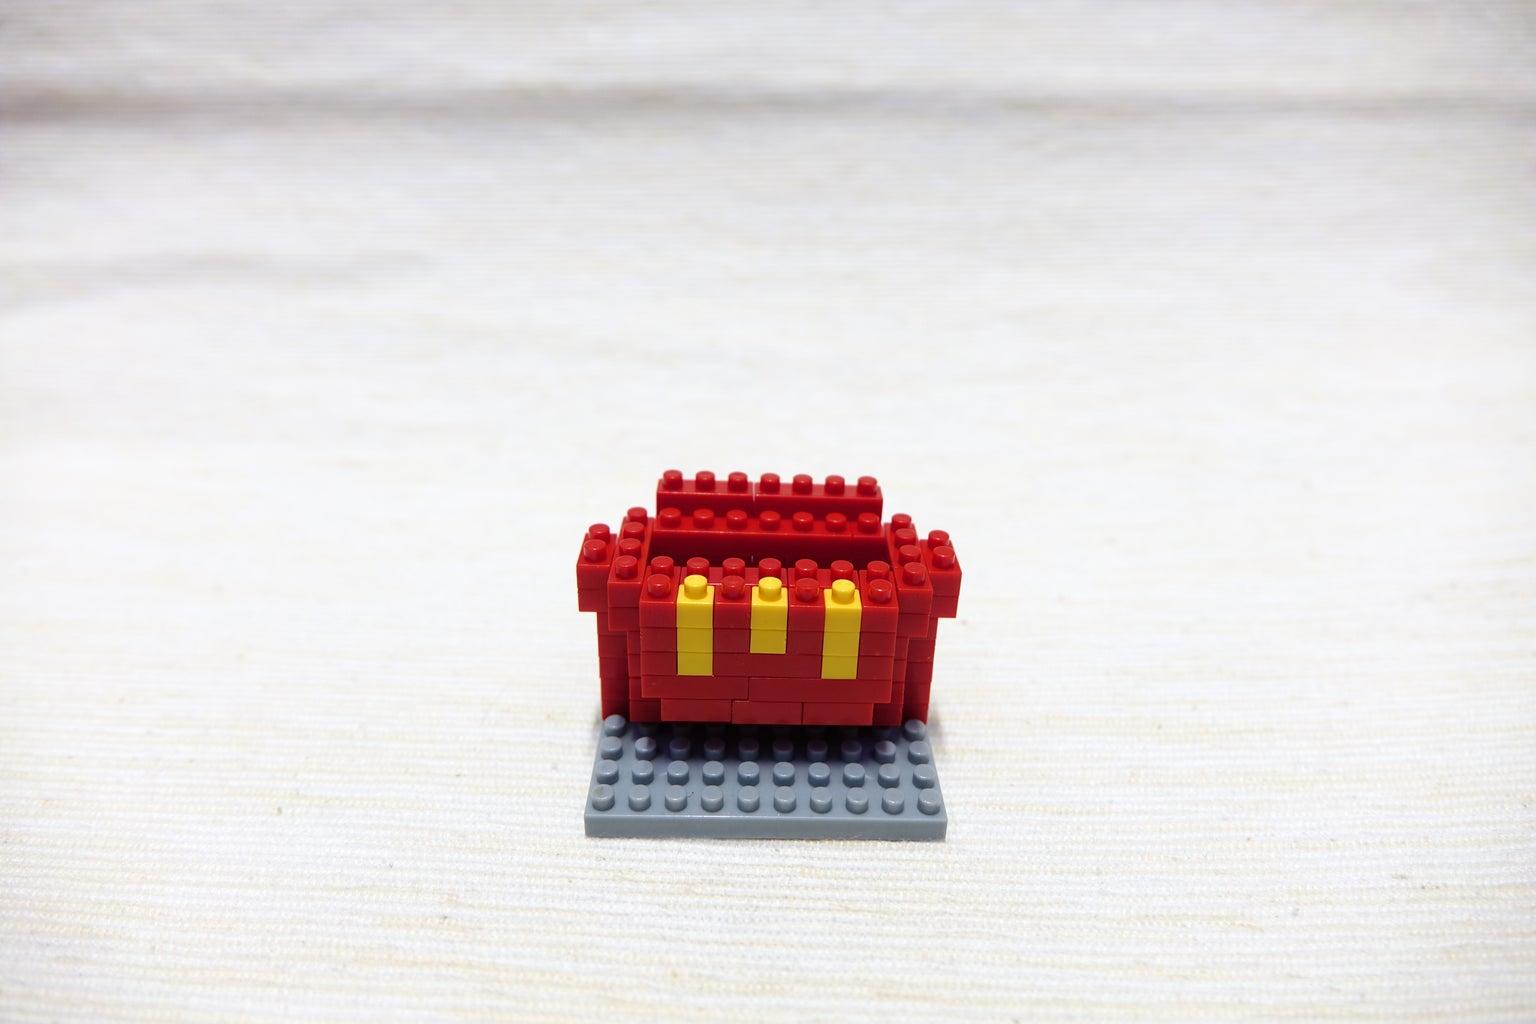 Red Block 1*3, 1*4